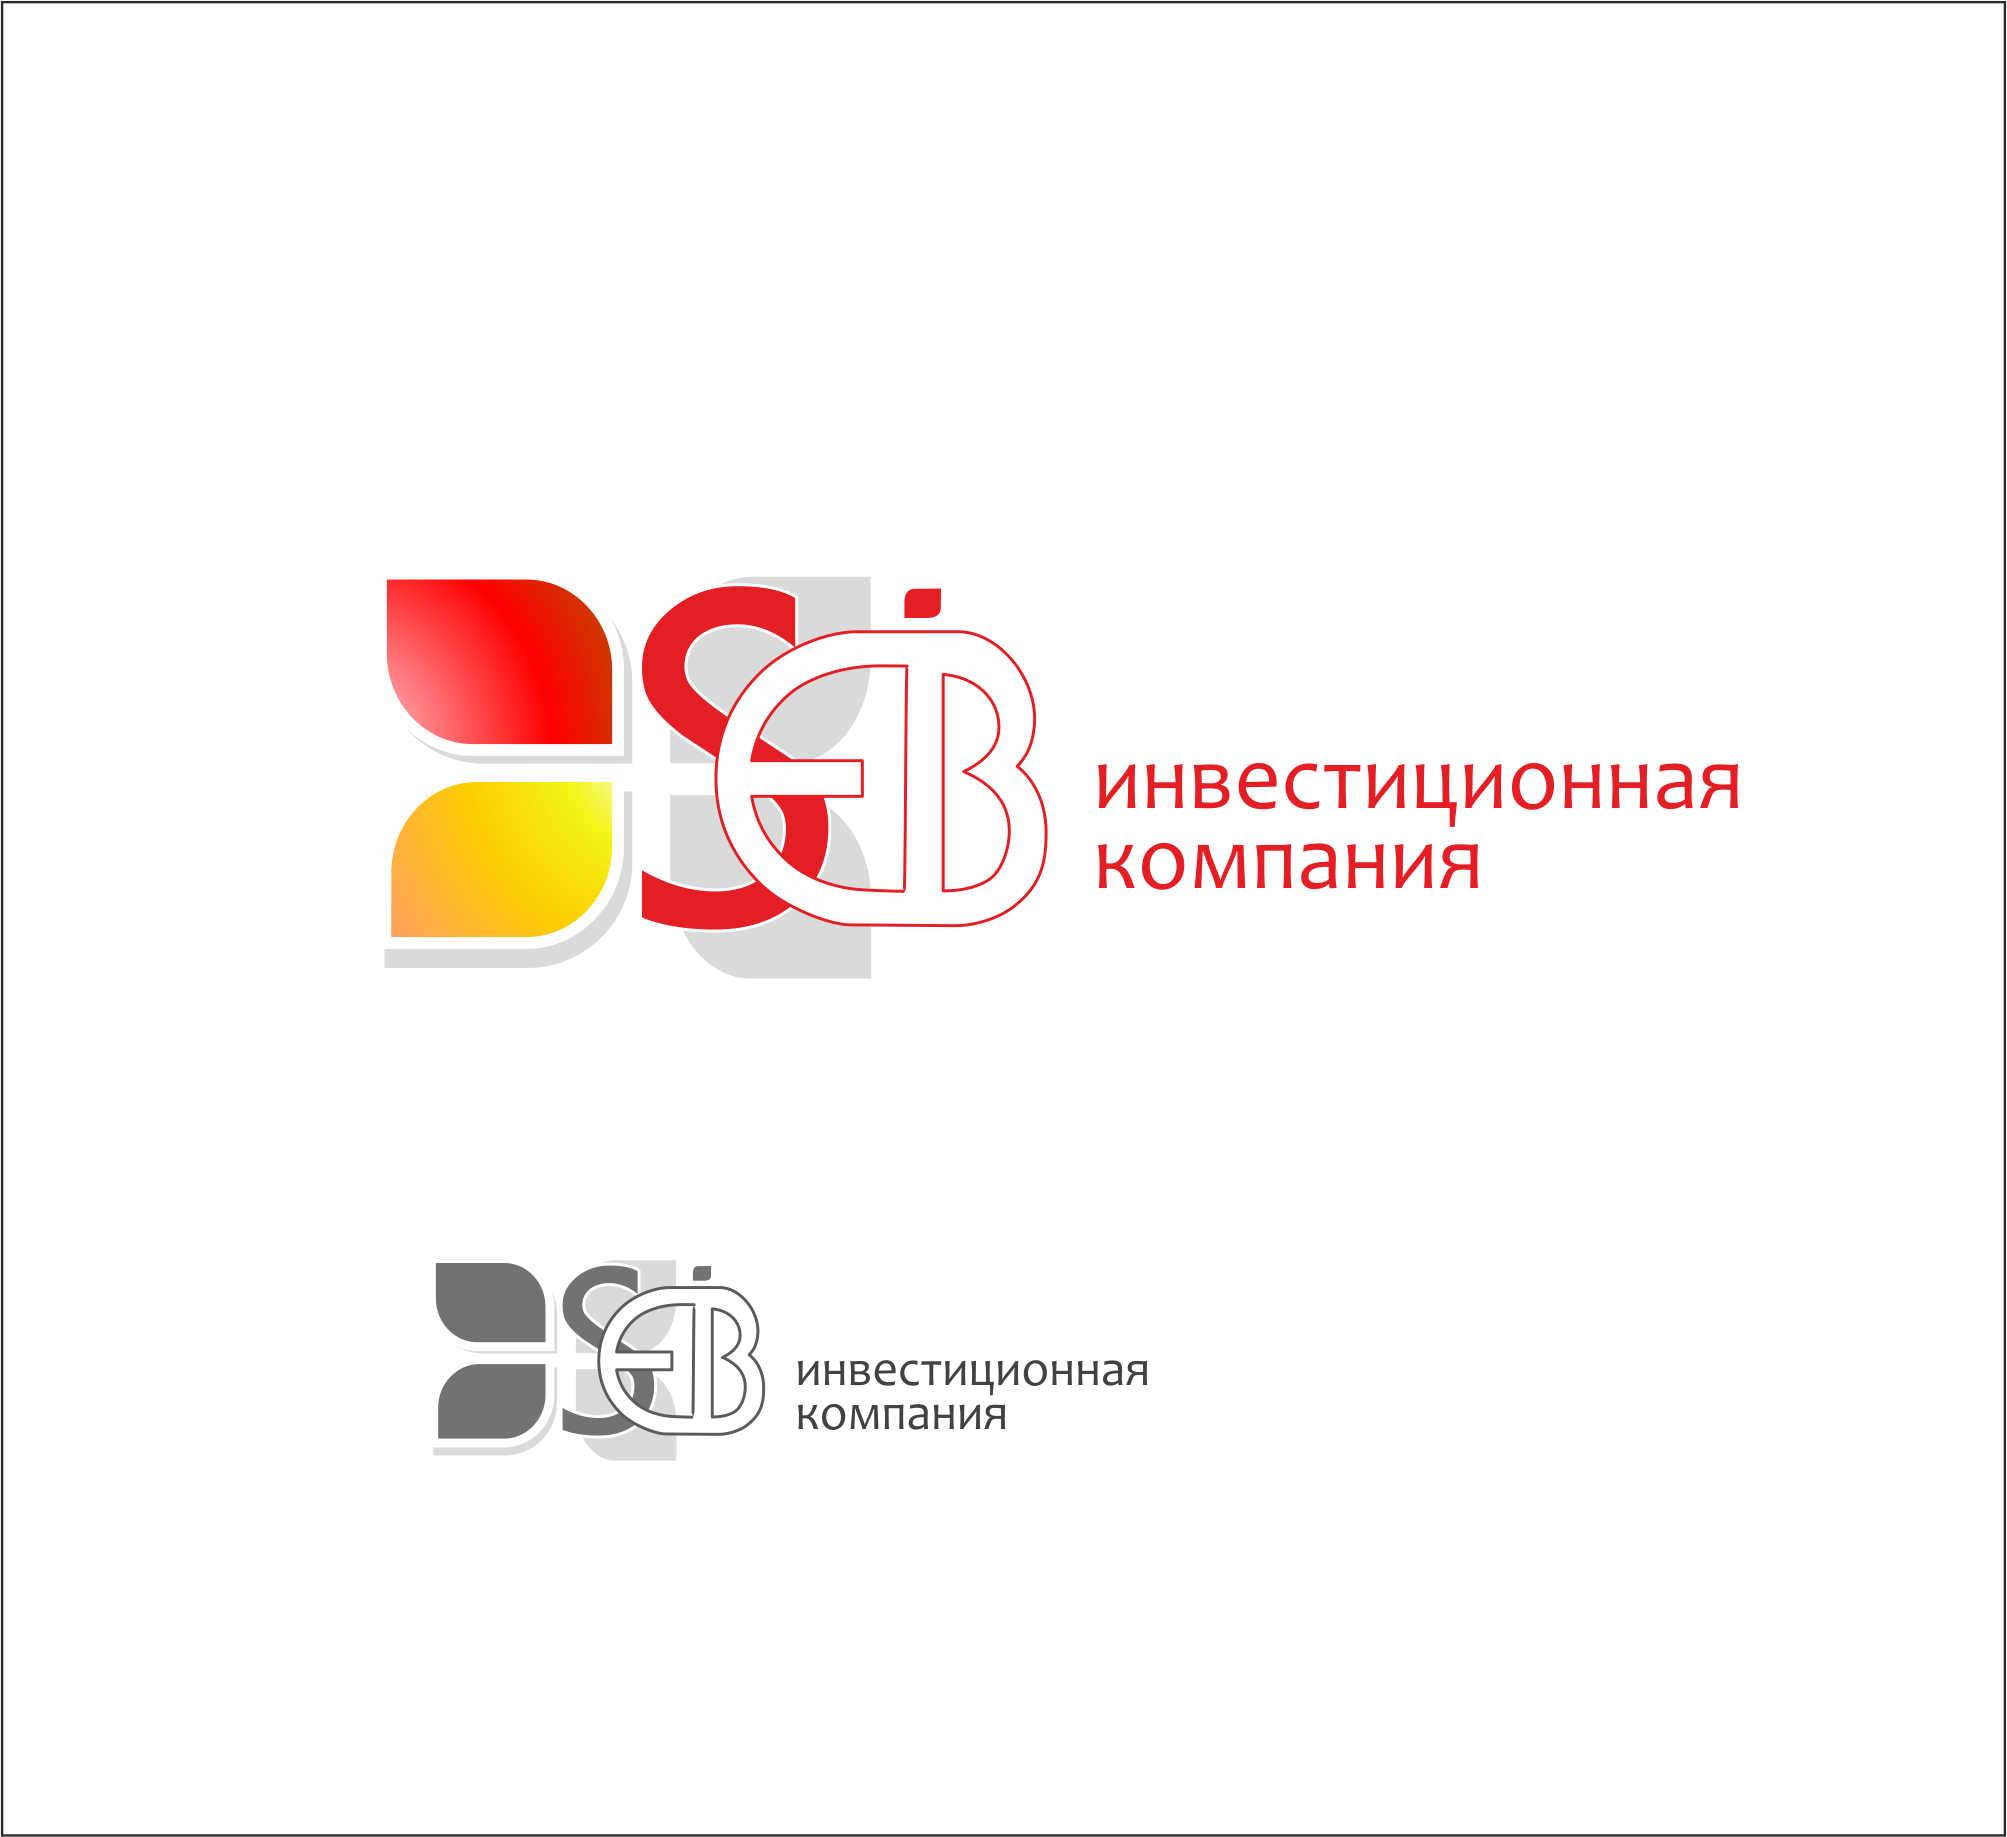 Логотип для инвестиционной компании фото f_2955150b65a4e092.jpg